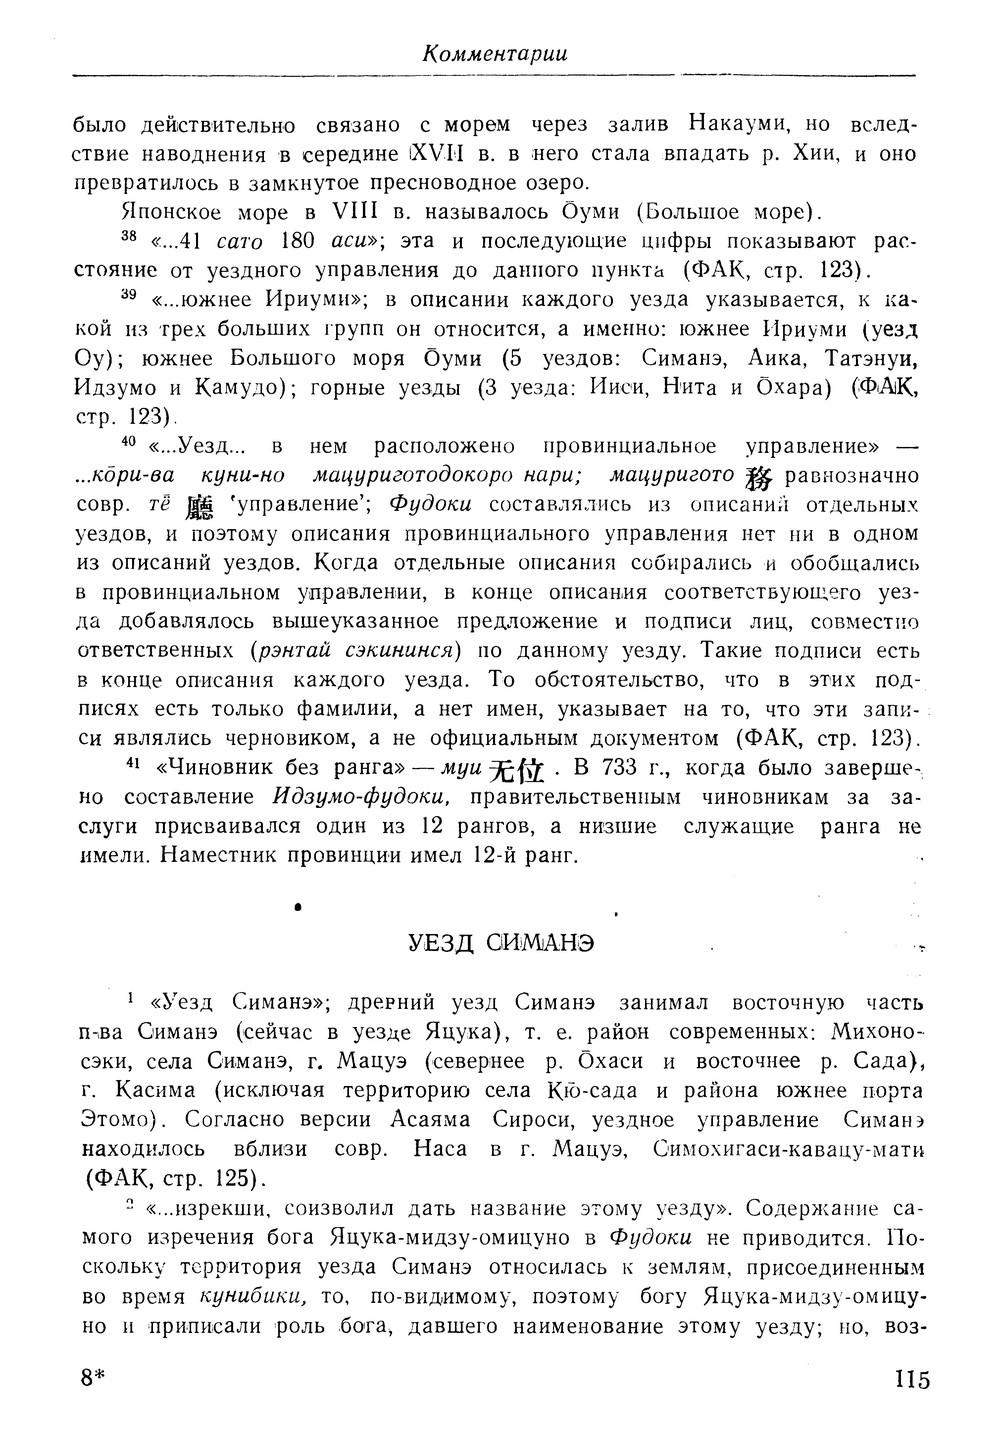 http://i5.imageban.ru/out/2014/01/20/fe841d01b767c89c4f8bbf91de2f0632.jpg